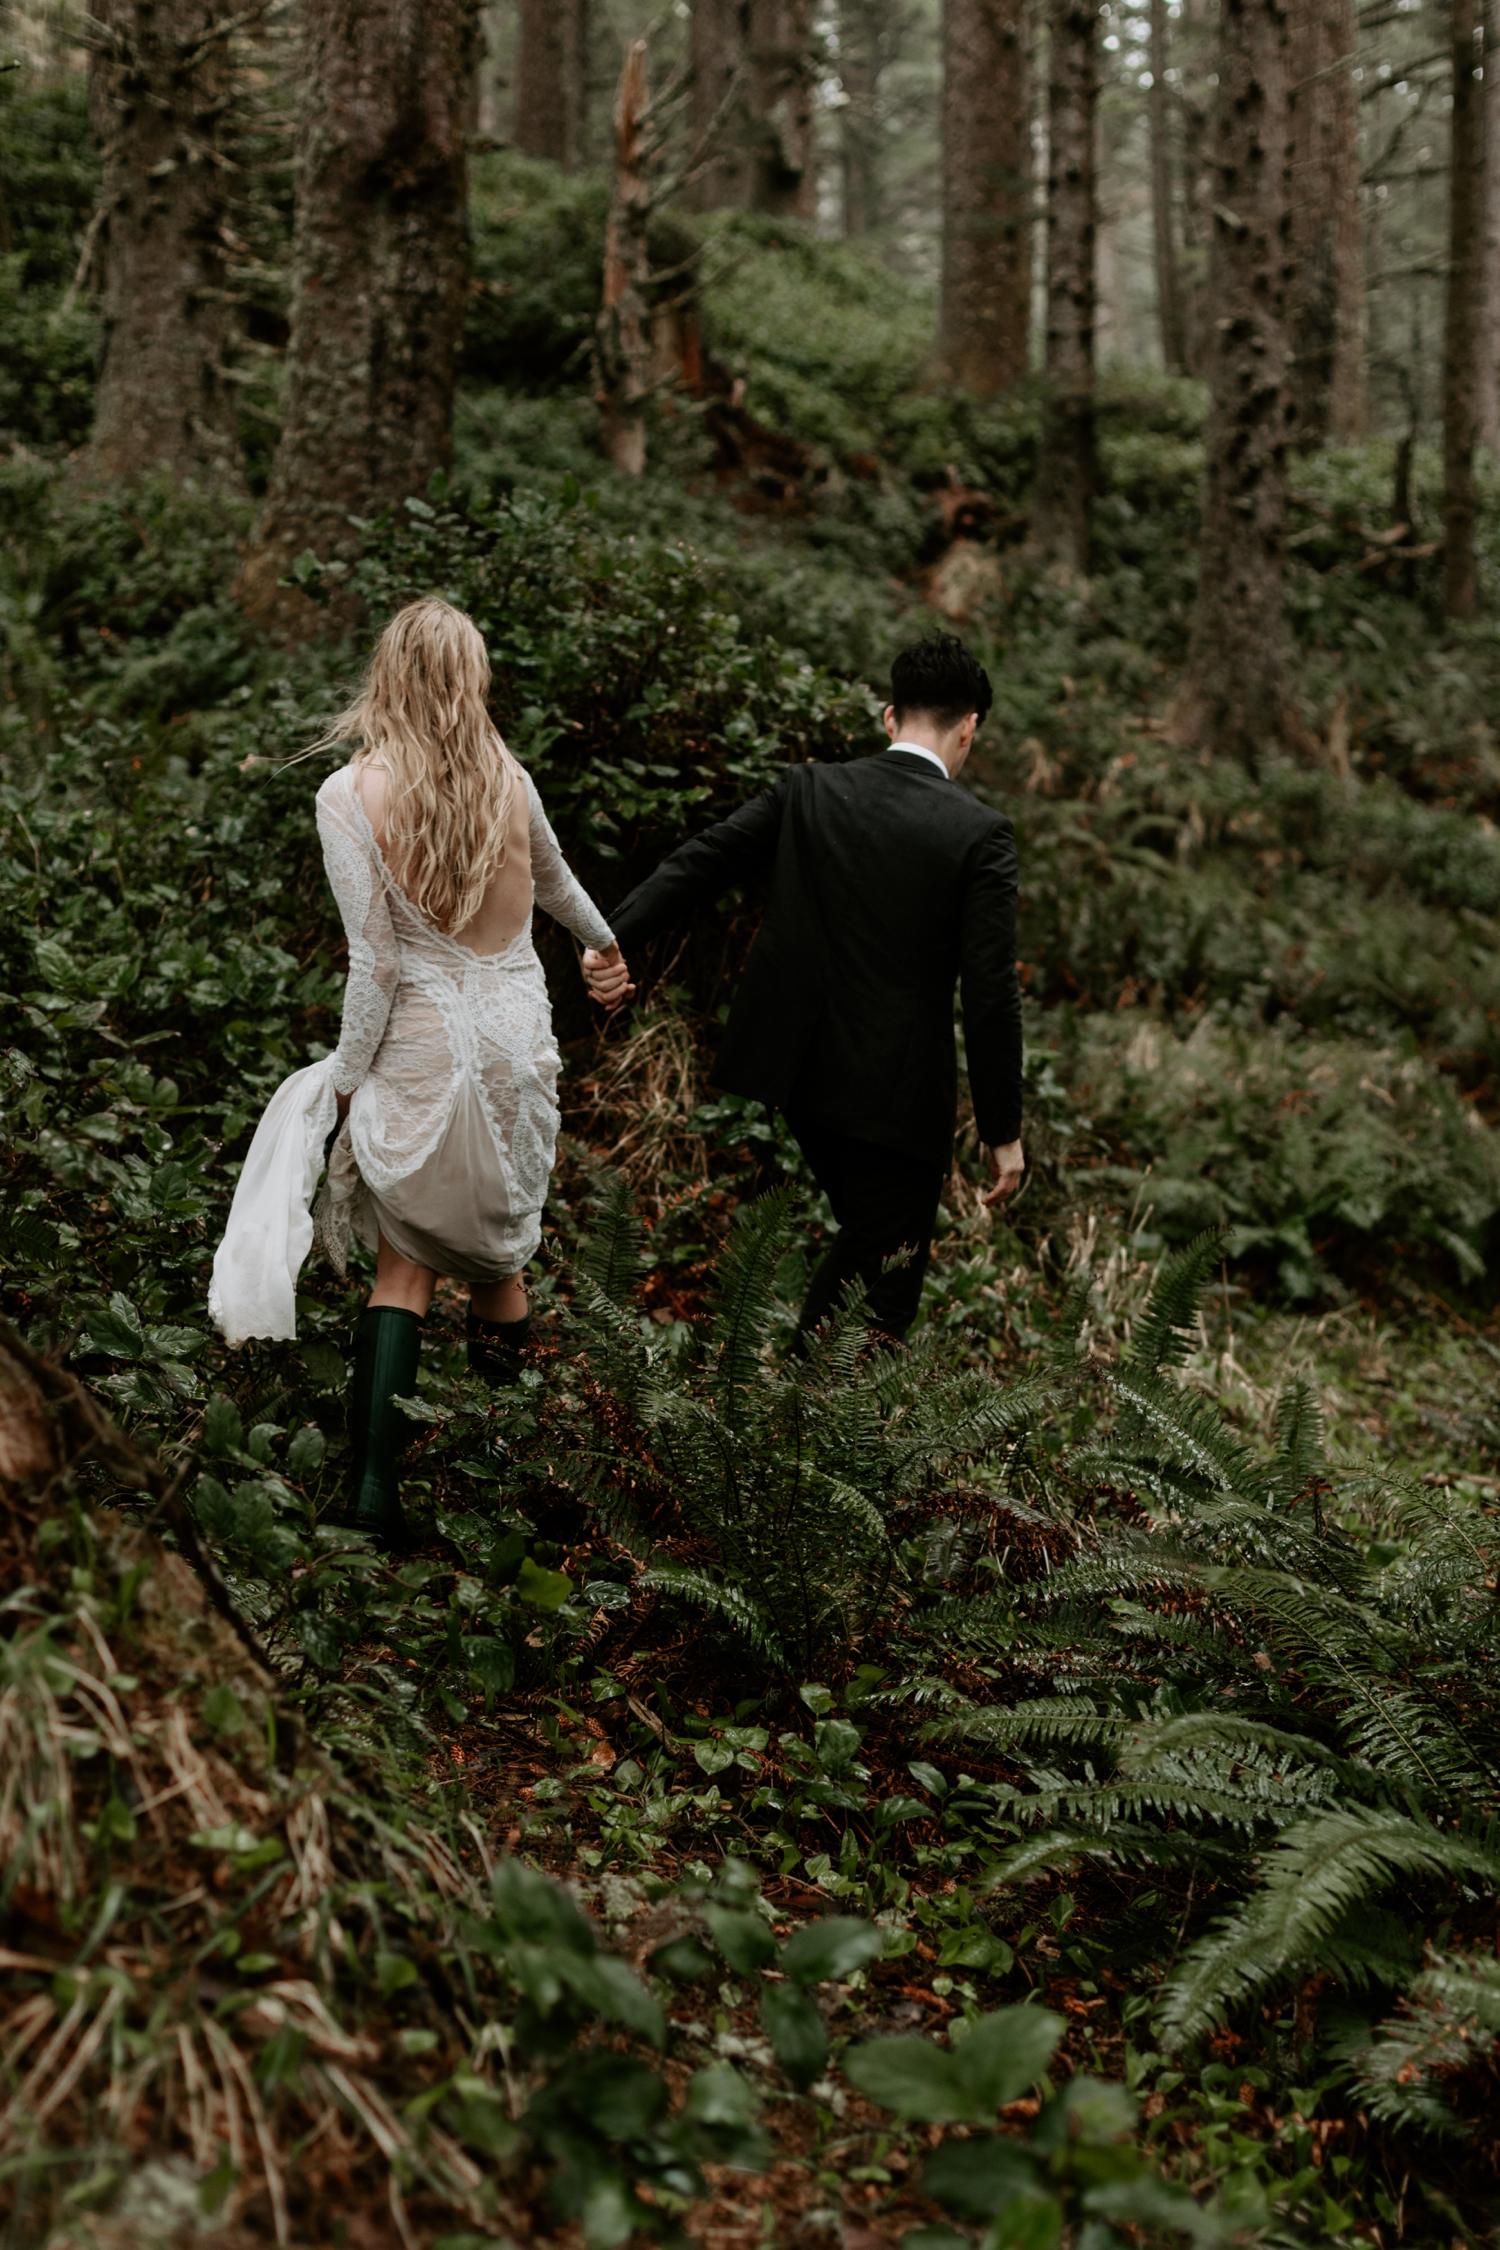 pnw-adventure-wedding-photographer-2018-05-02_0076.jpg